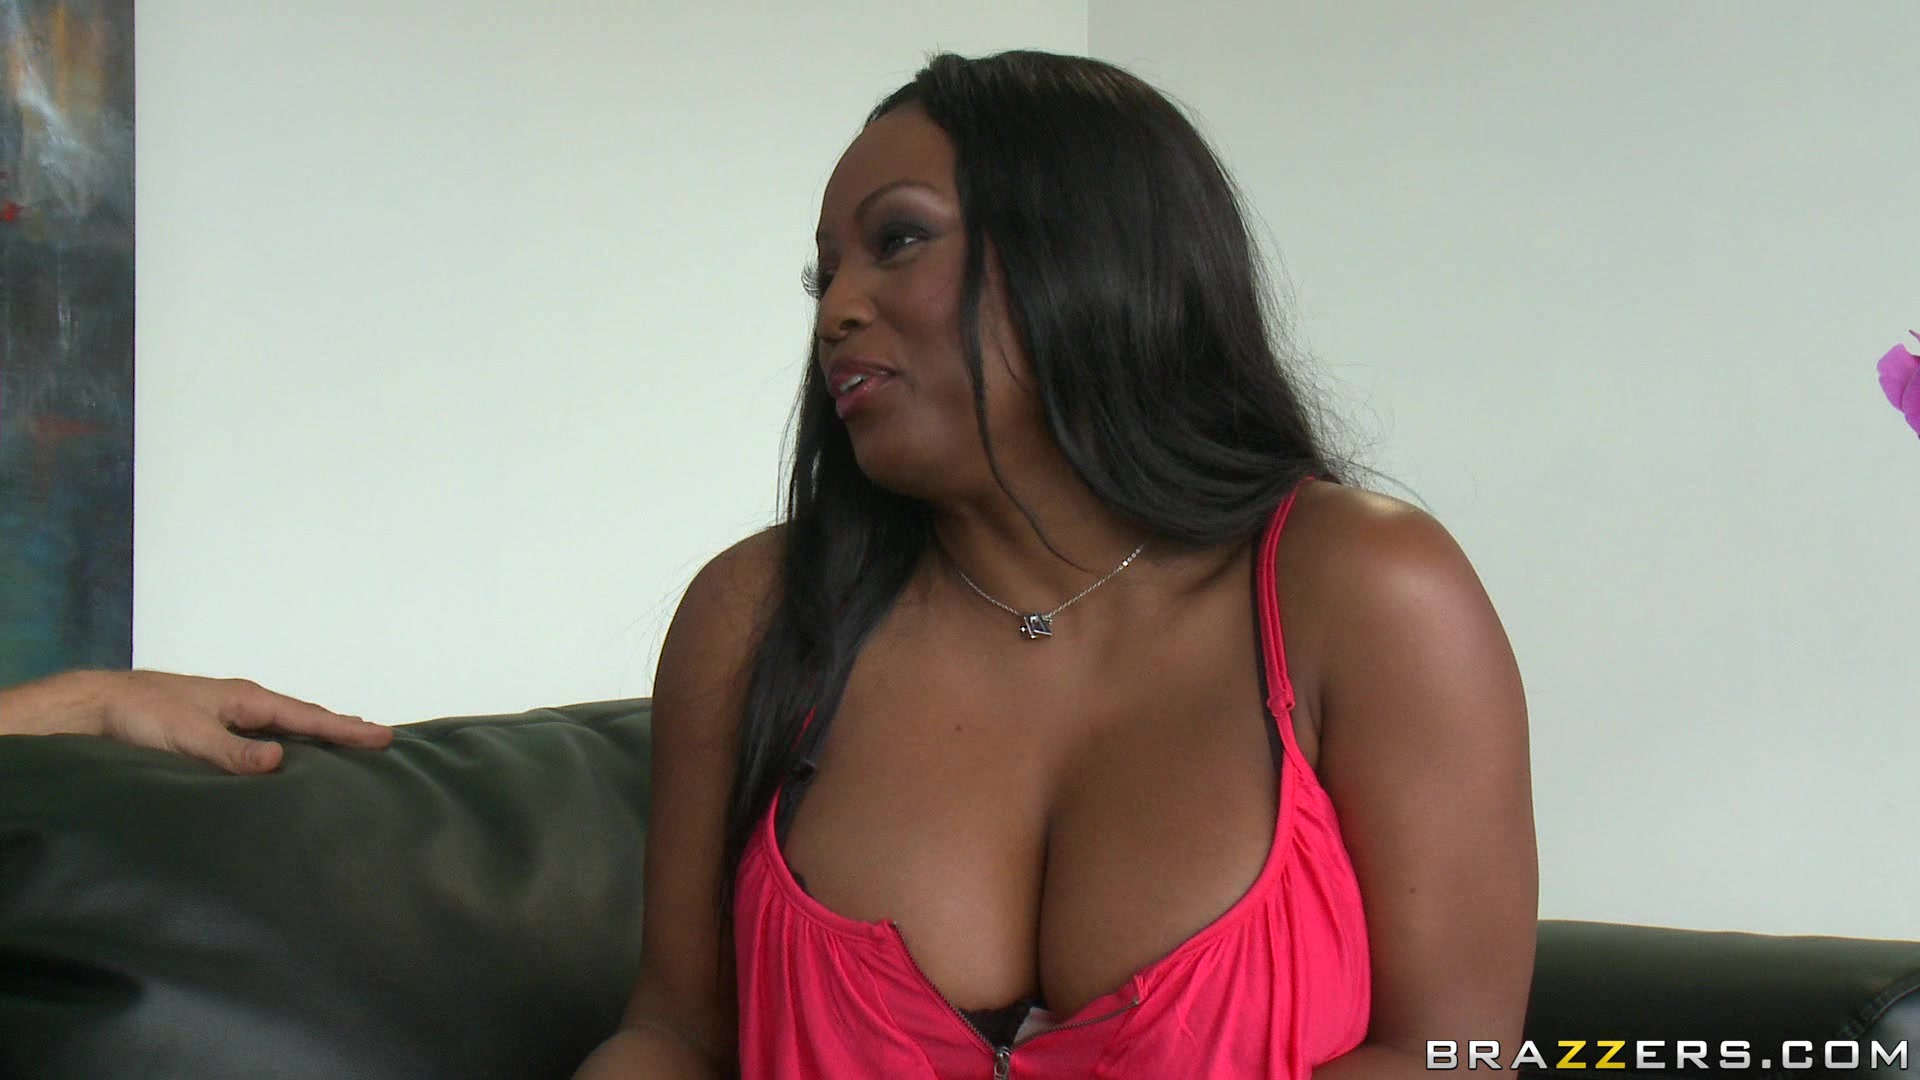 Mommy Got Boobs Vol 14 2012  Adult Dvd Empire-7516